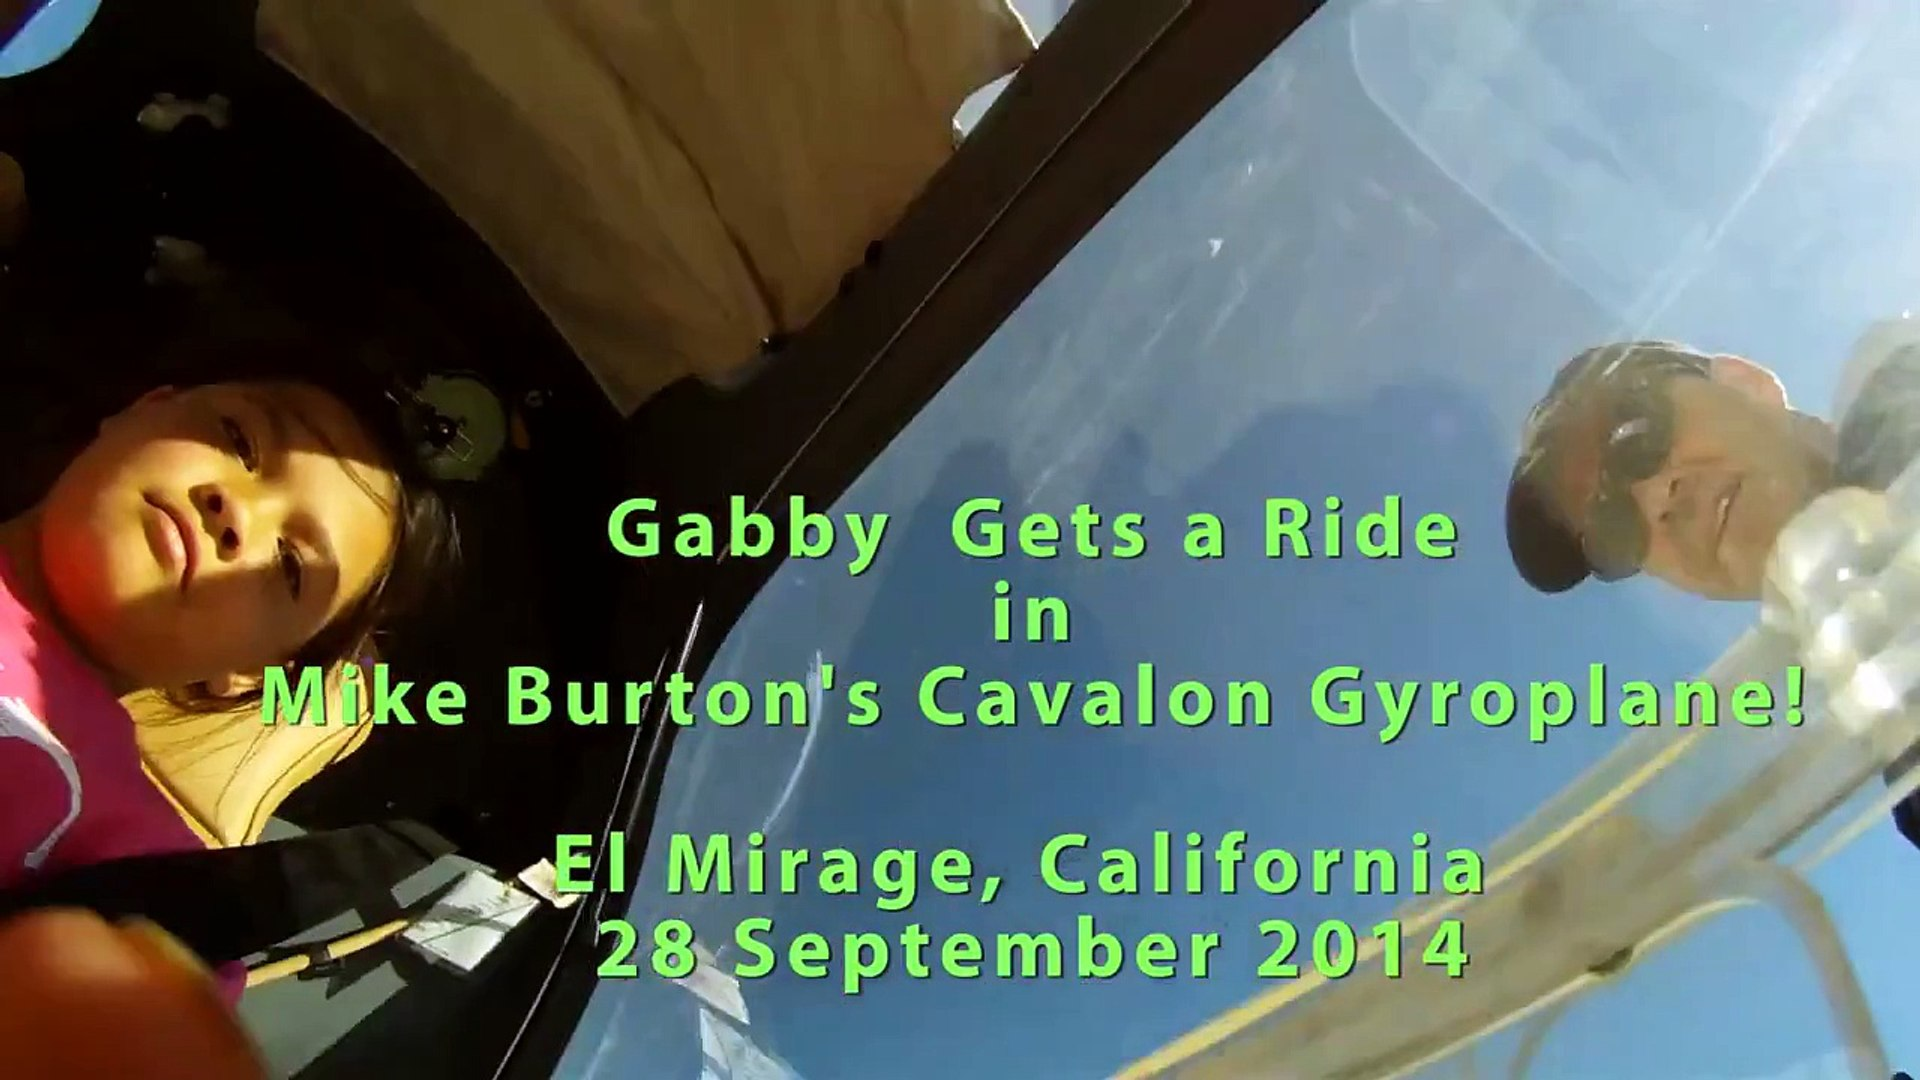 Gabby gets a ride in Mike Burton's Cavalon Gyroplane!